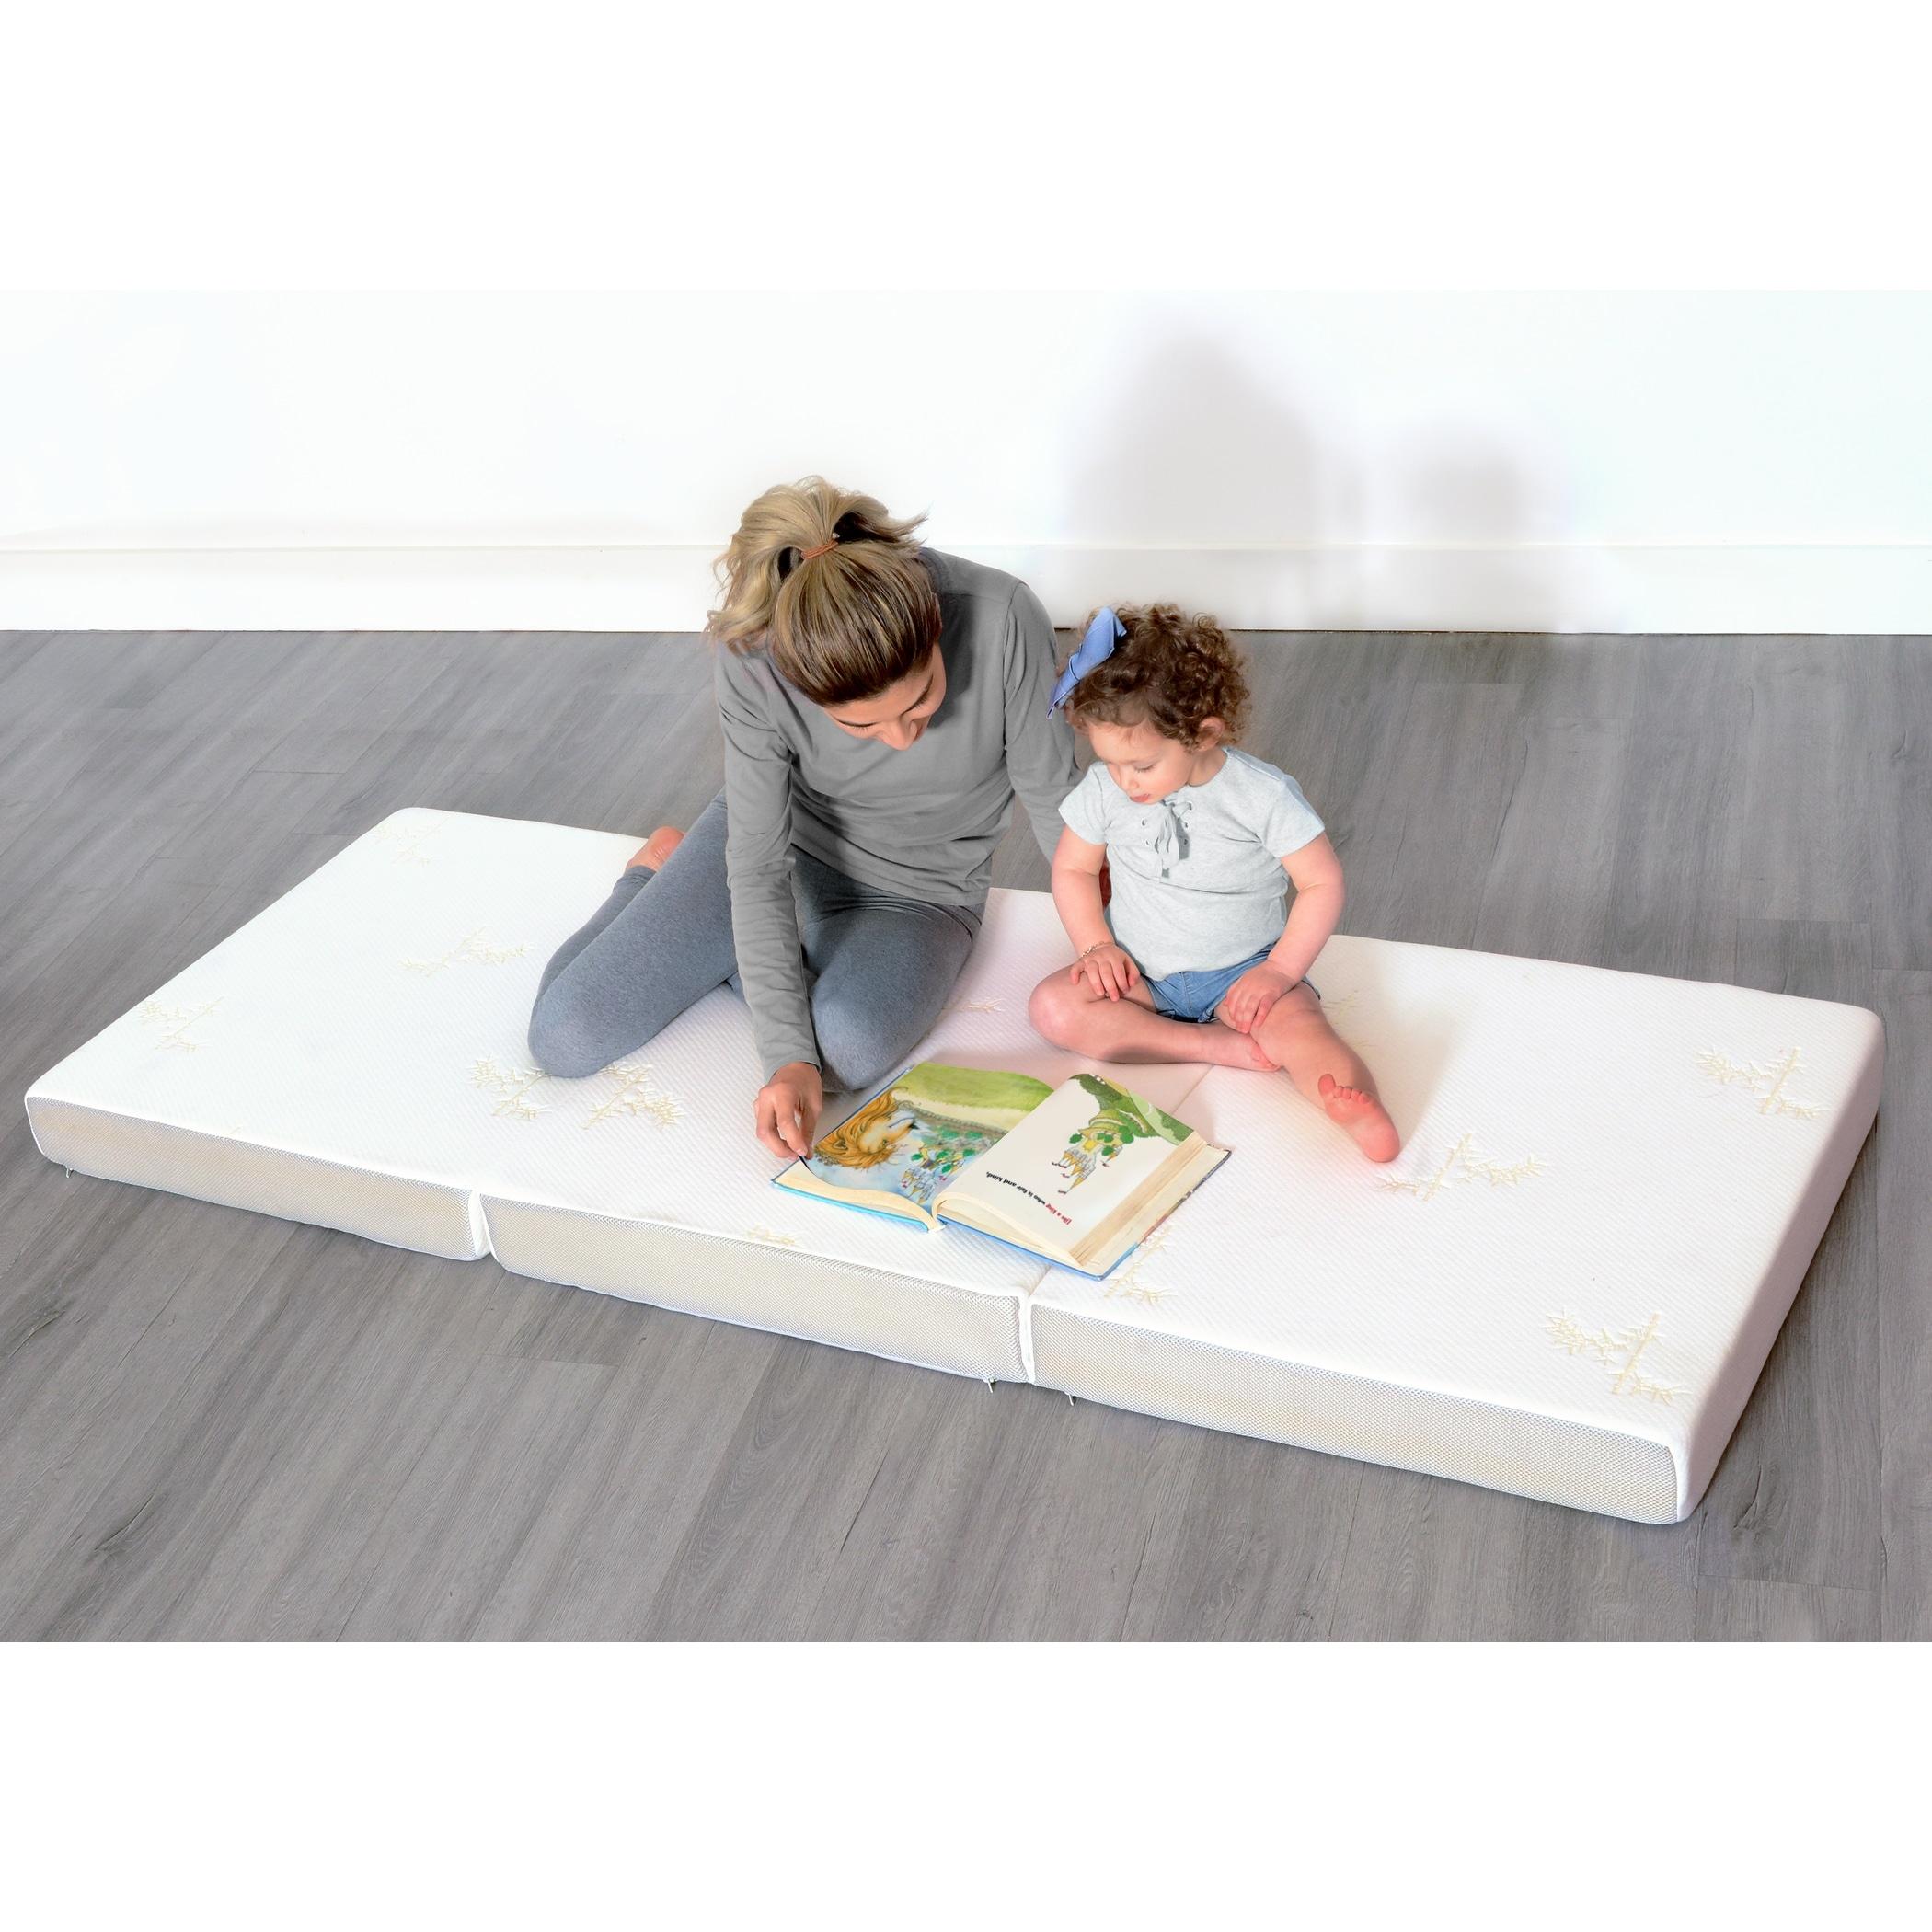 Milliard 6 Inch Memory Foam Tri Fold Full Size Mattress Overstock 21827442